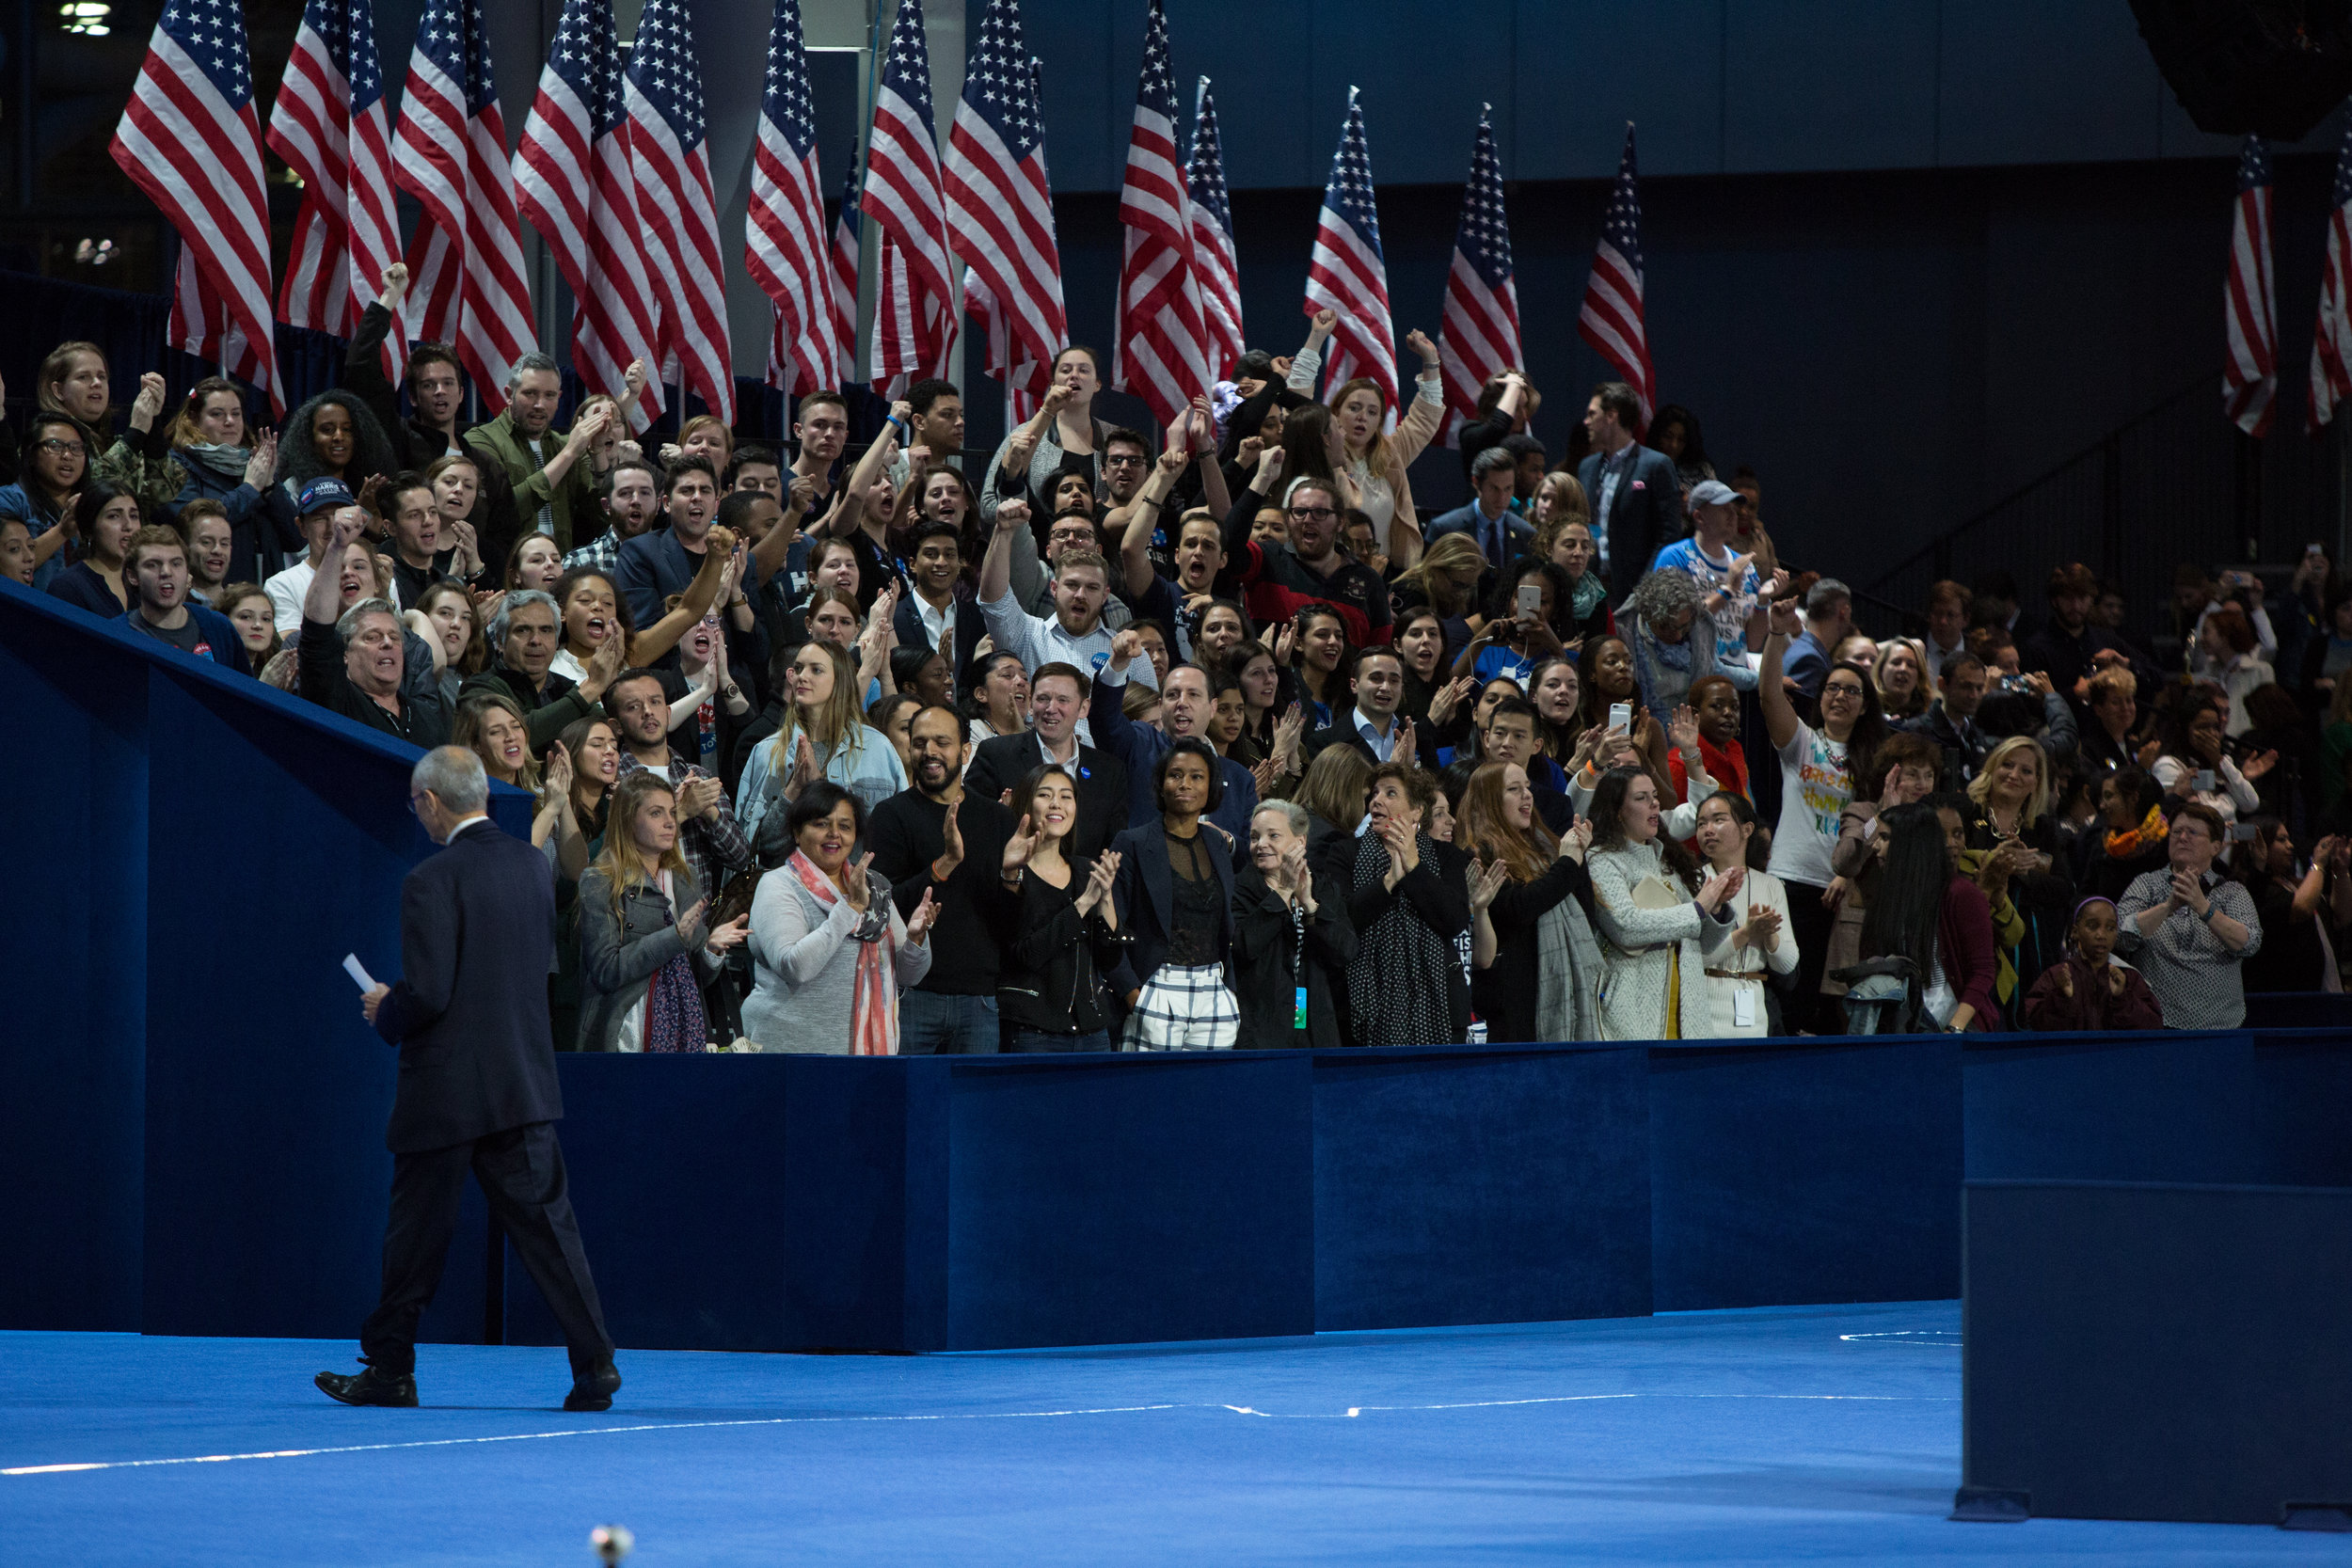 Clinton Campaign Chairman John Podesta Exits The Stage